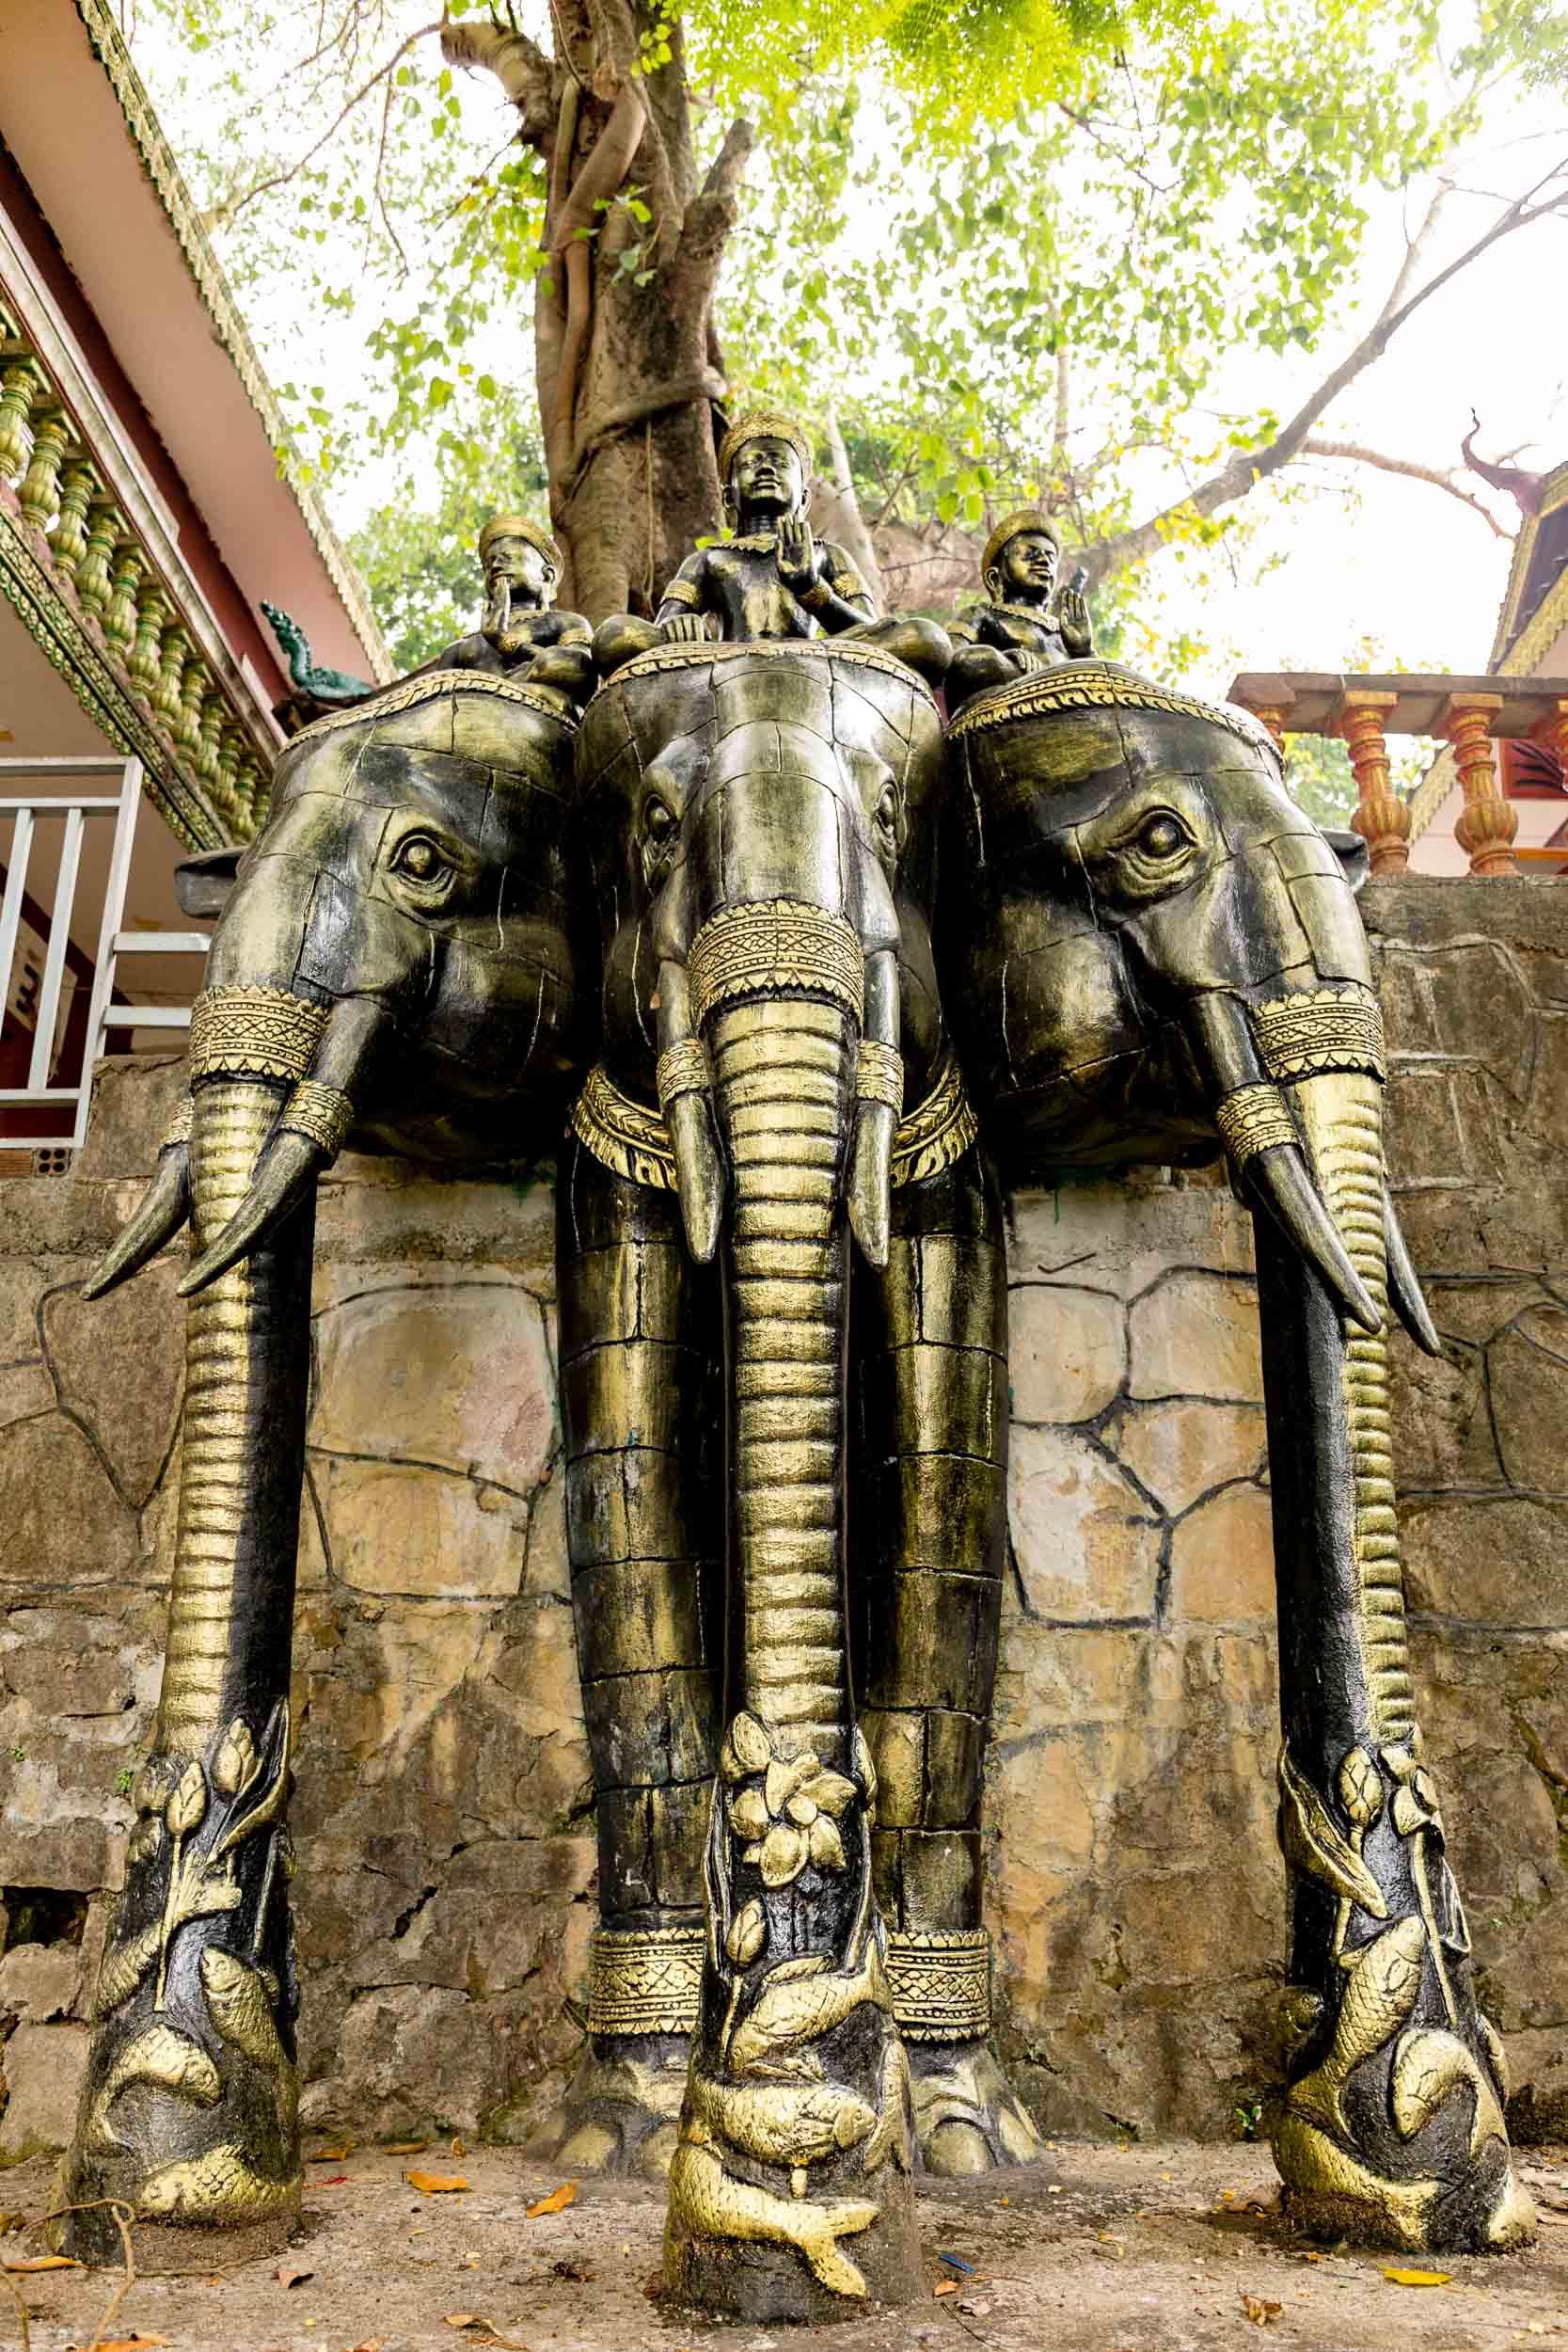 Triple Elephant statue at Buddha Temple - Sihanoukville, Cambodia - Rupert Turkington Travel Photography